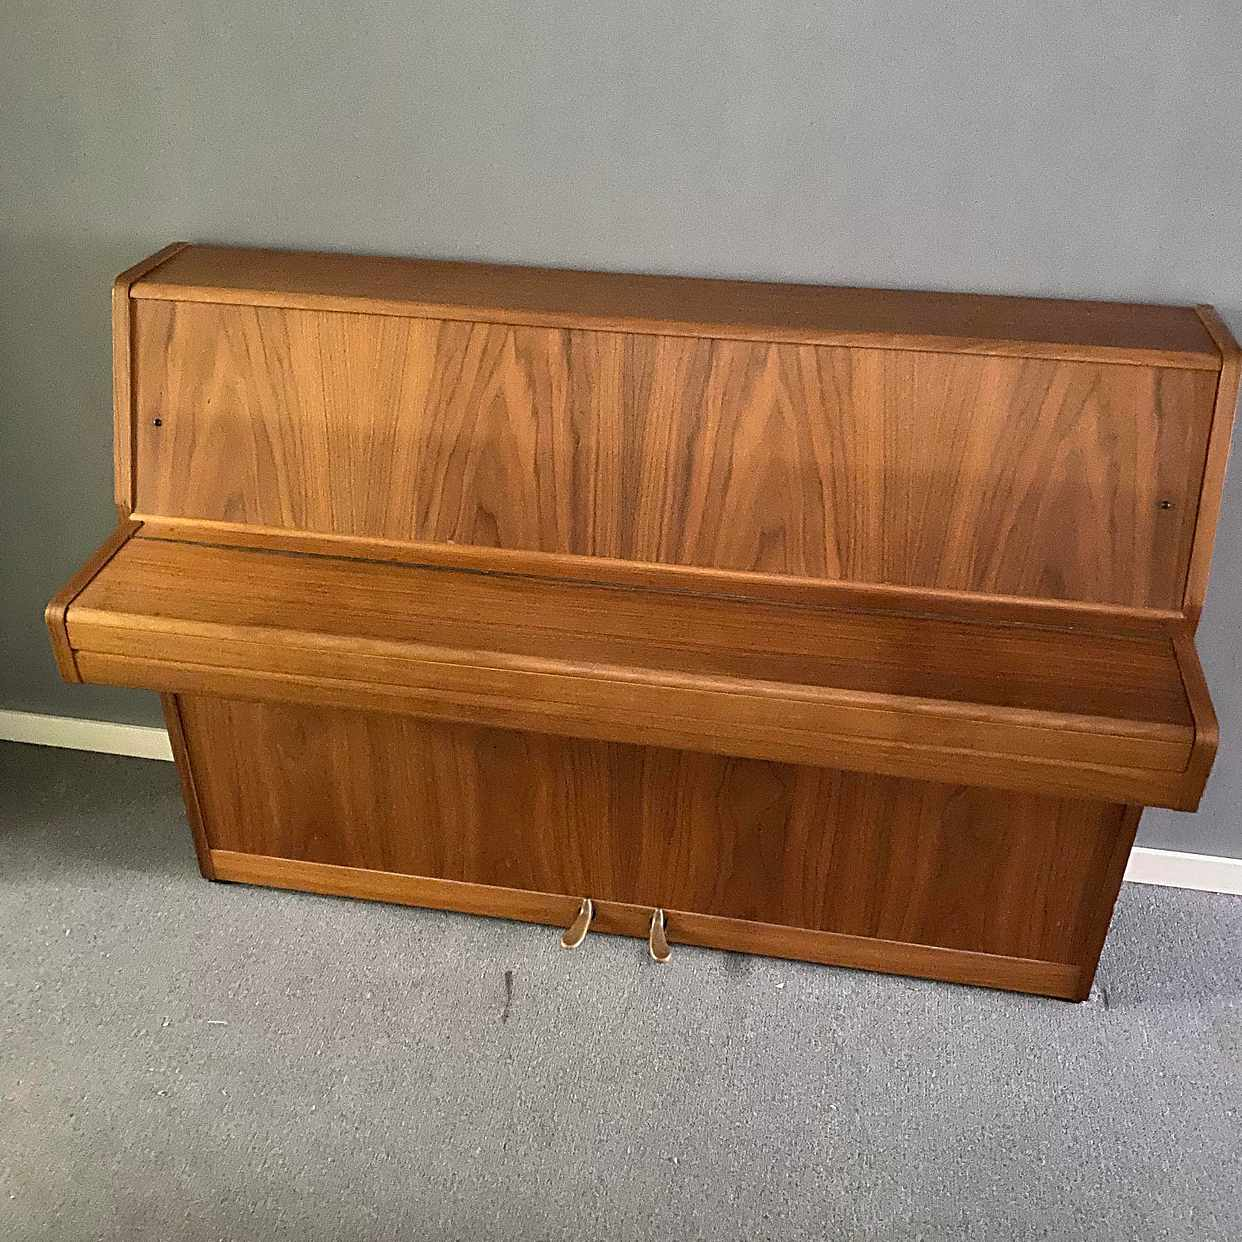 image of Piano - Huddinge